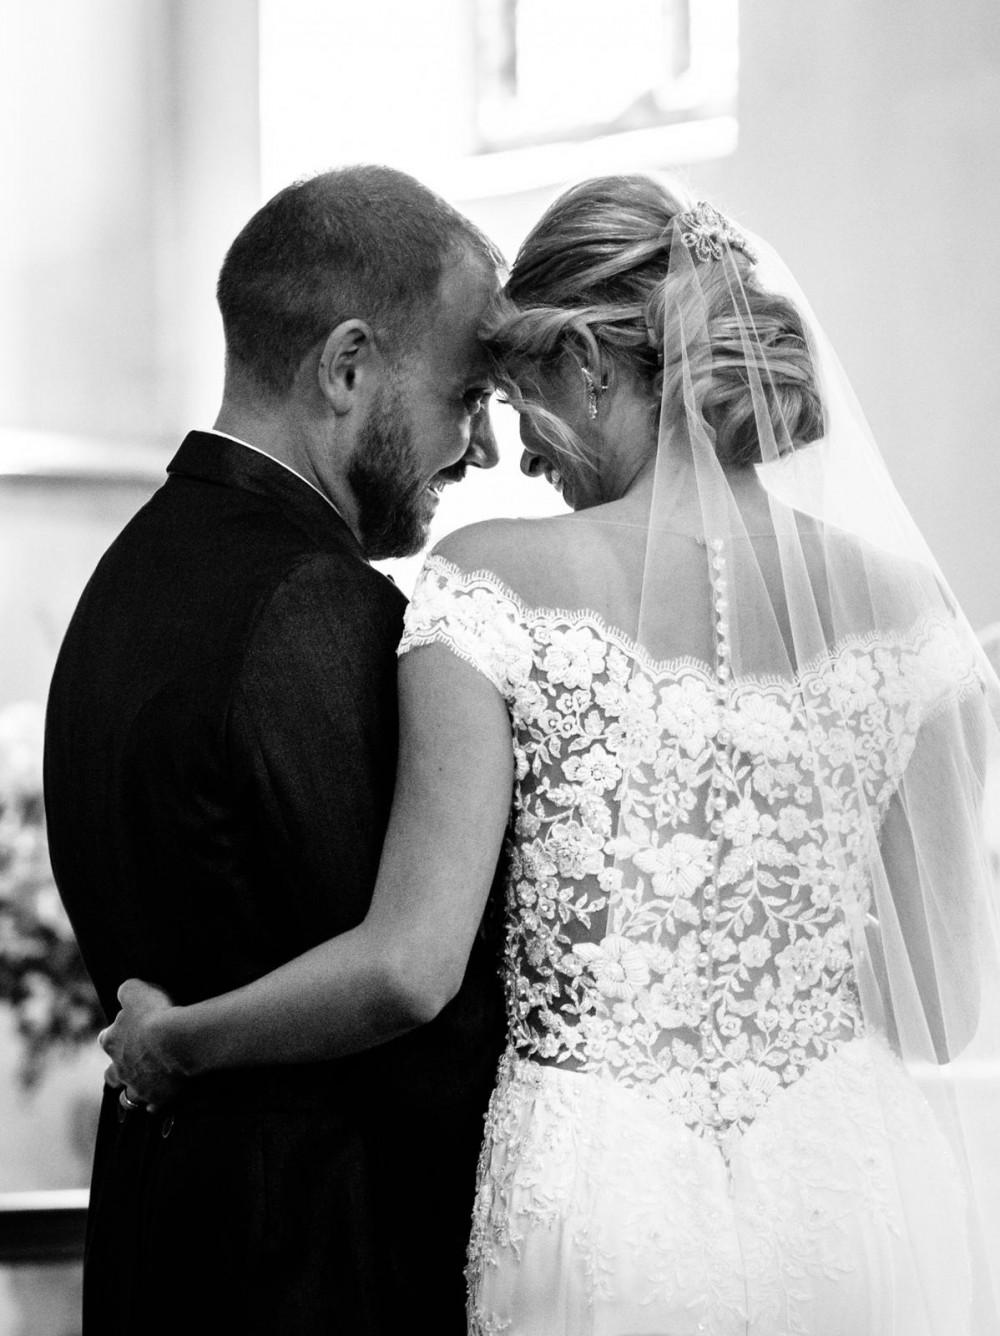 Textured updo - Make Me Bridal Artist: Head Turners - Martine Turner. Photography by: Gosia Grant. #bridalhair #texturedupdo #bridalupdo